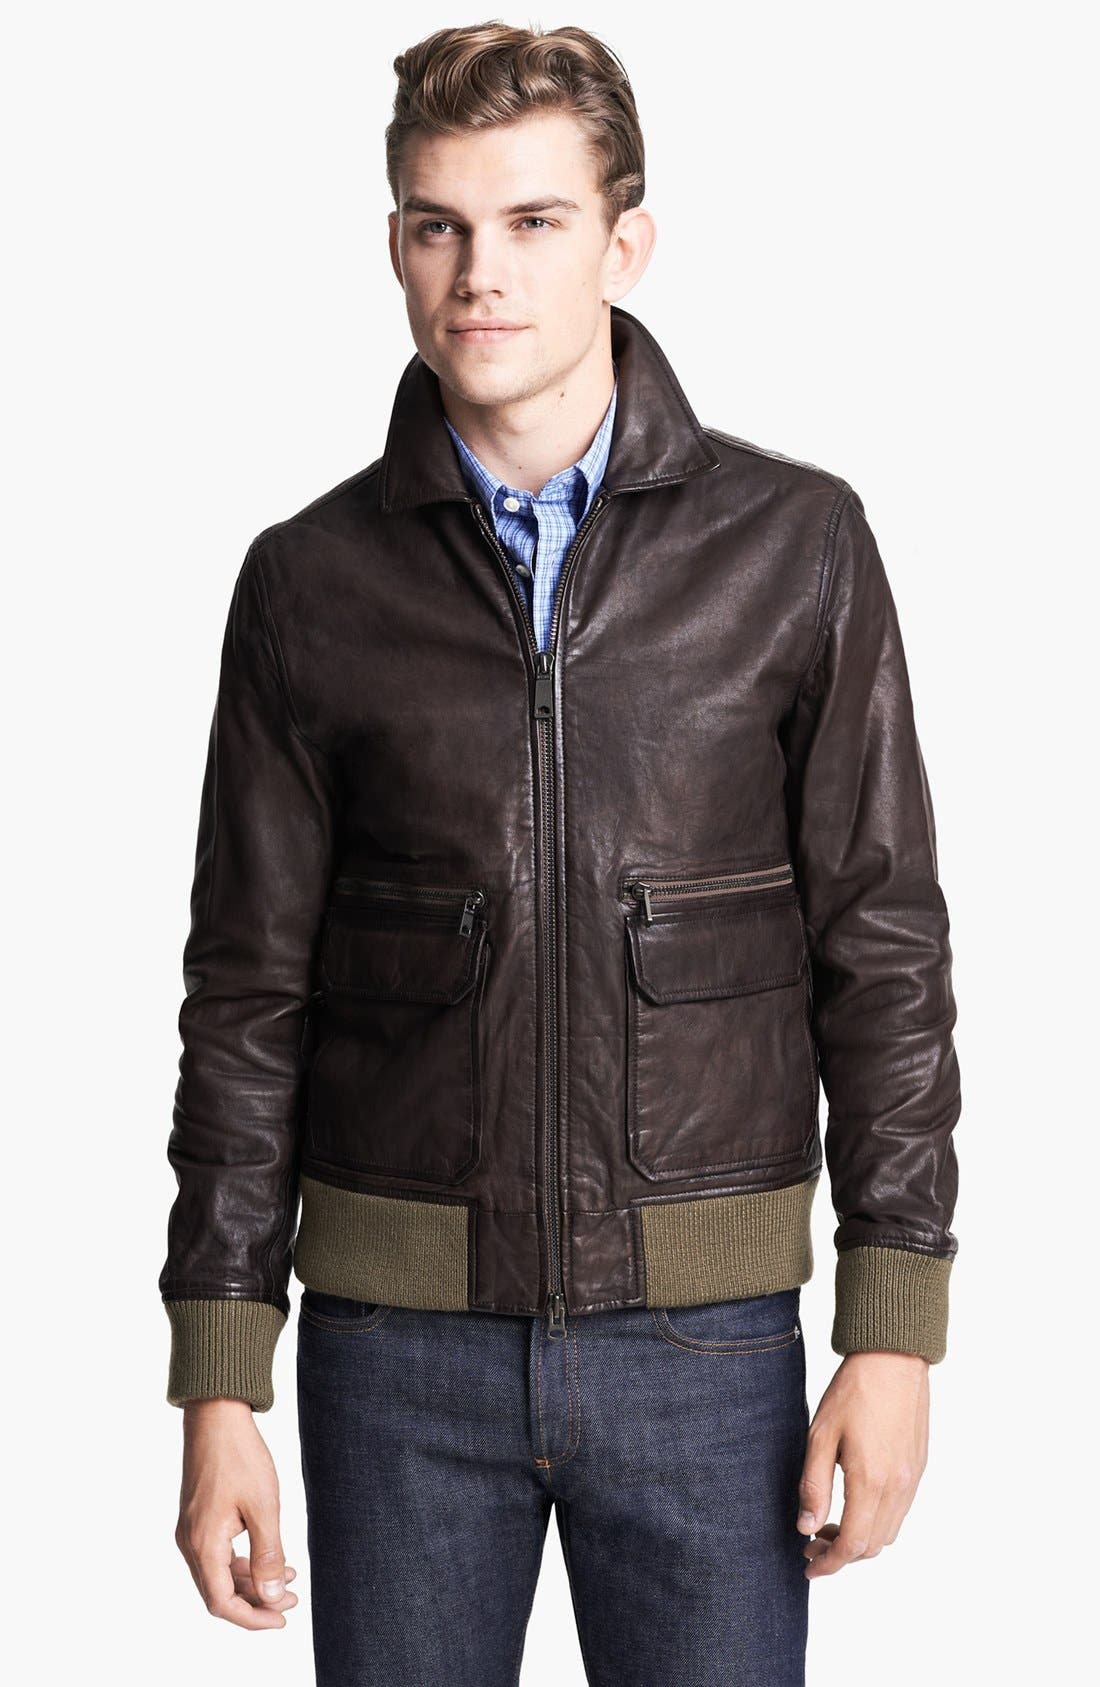 JACK SPADE 'Huxley' Leather Bomber Jacket, Main, color, 200